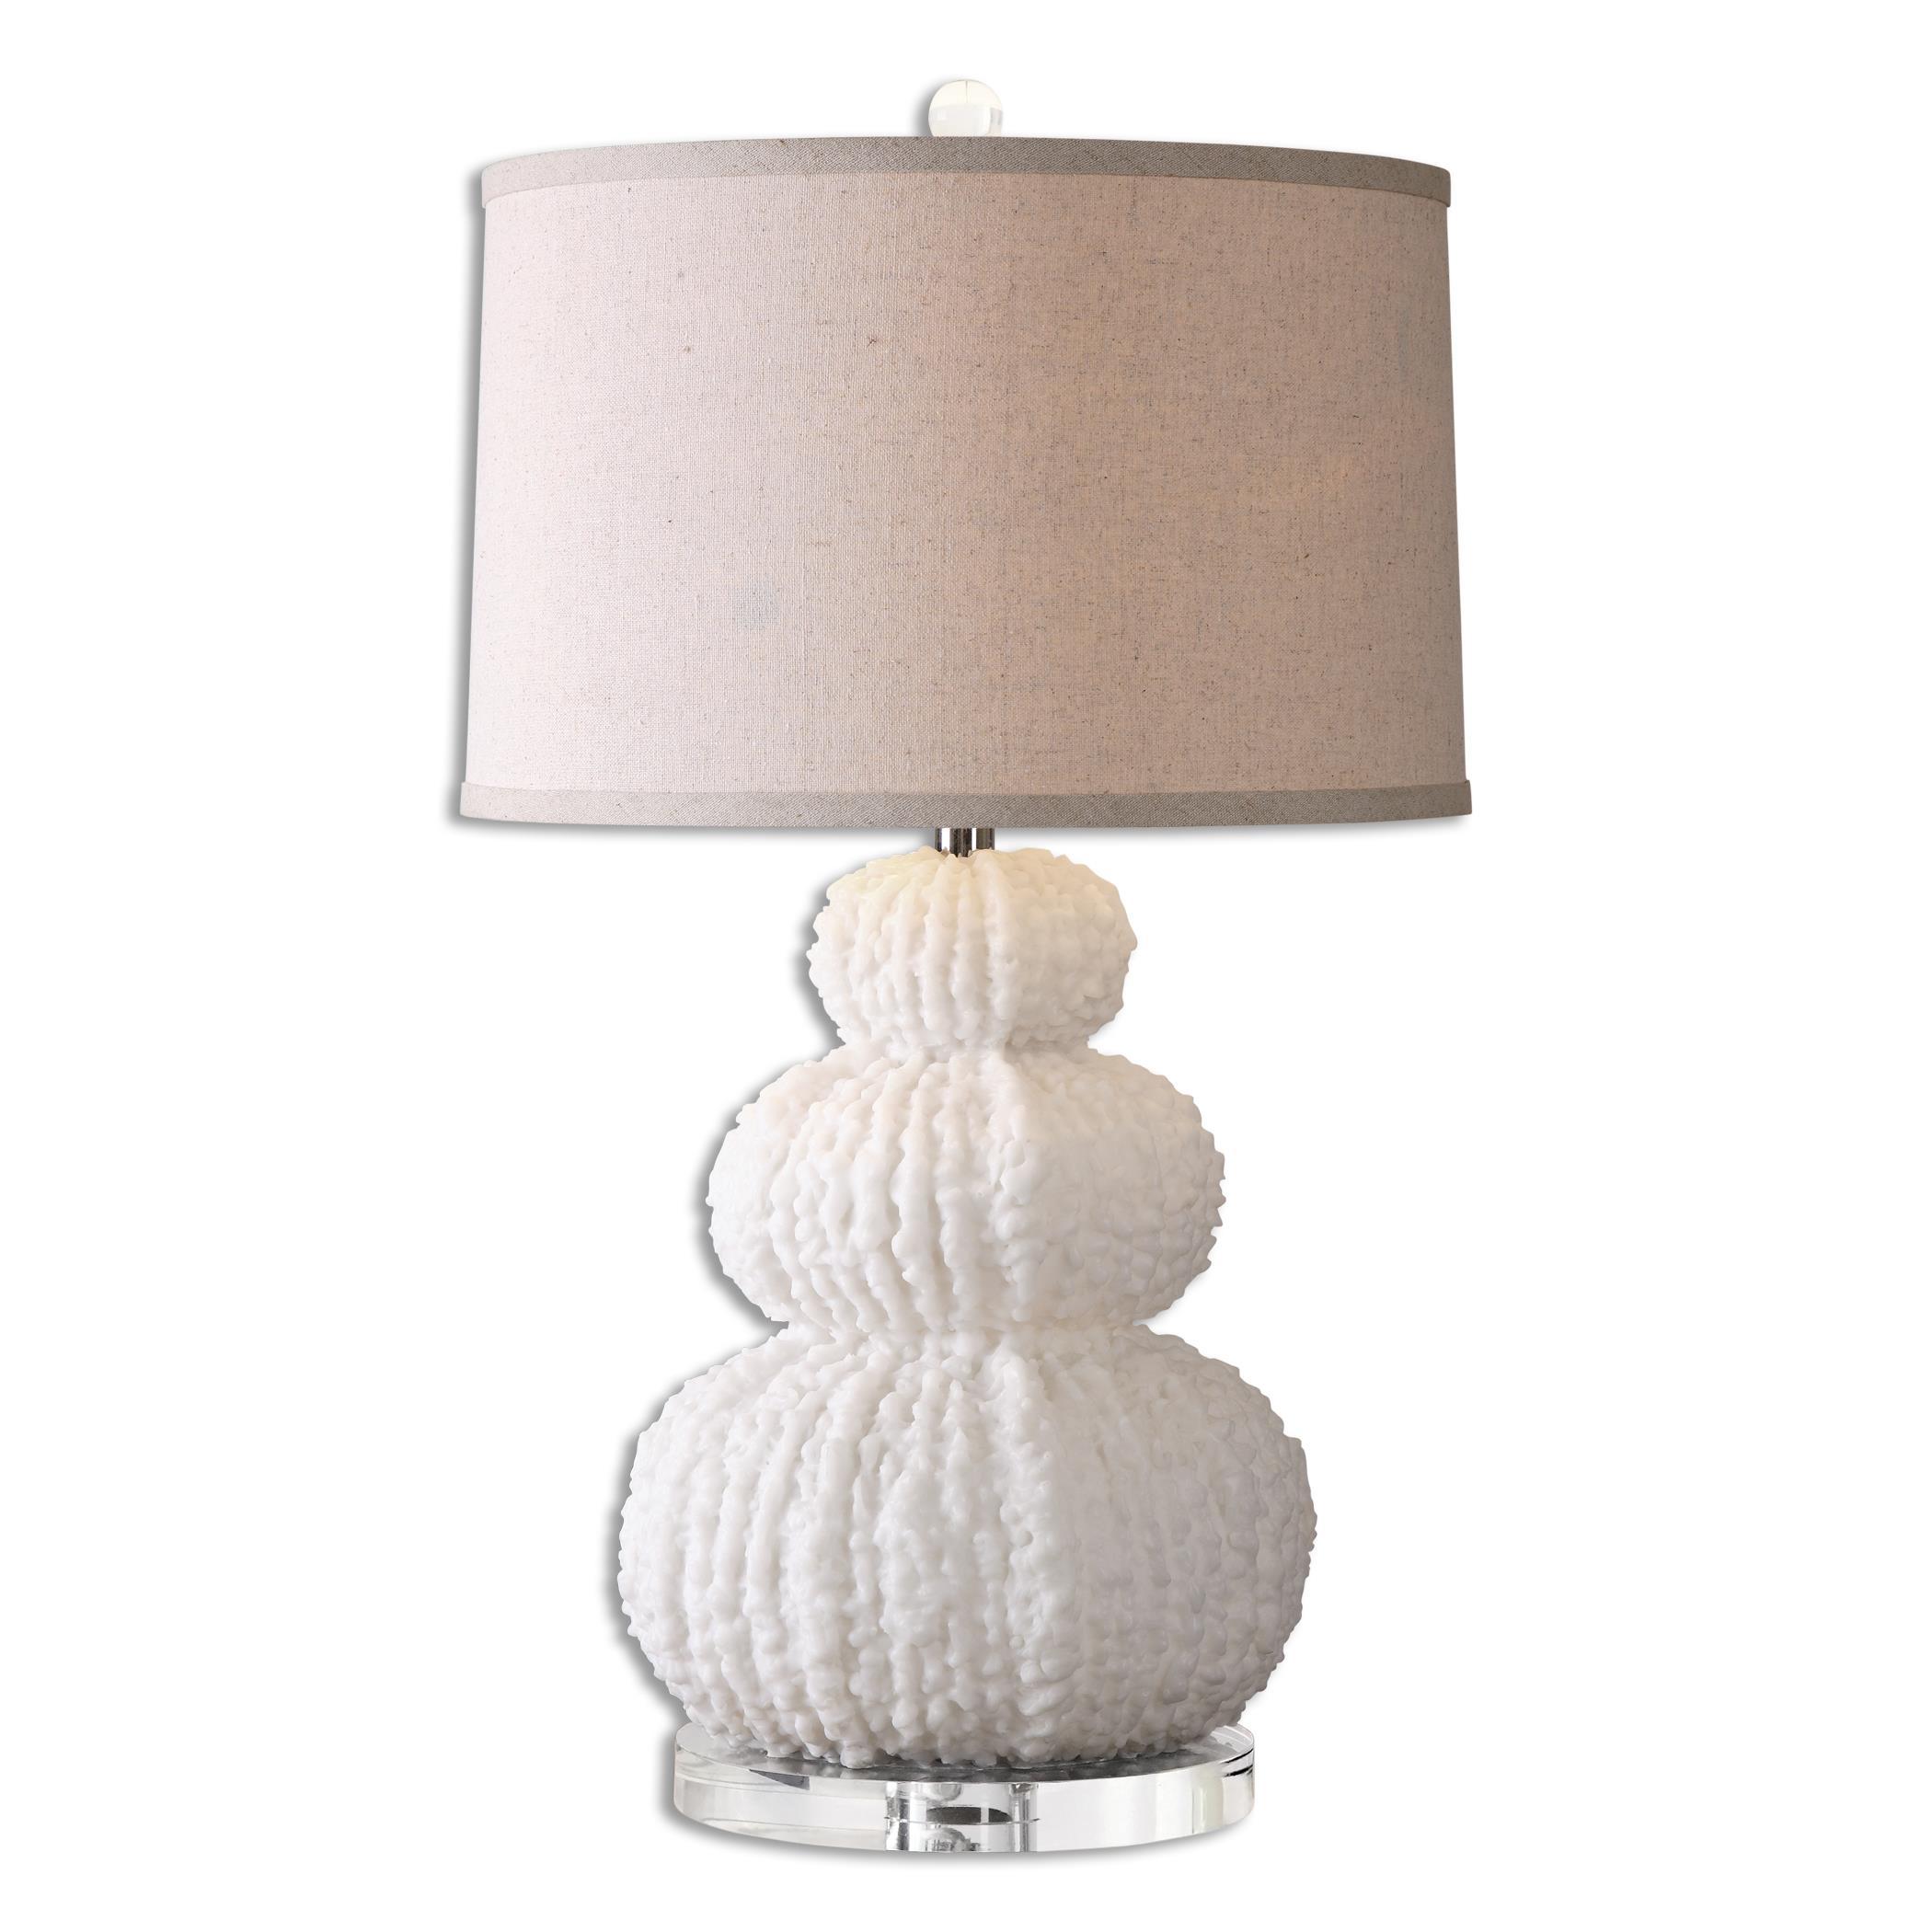 Beau Uttermost LampsFontanne Shell Ivory Table Lamp ...